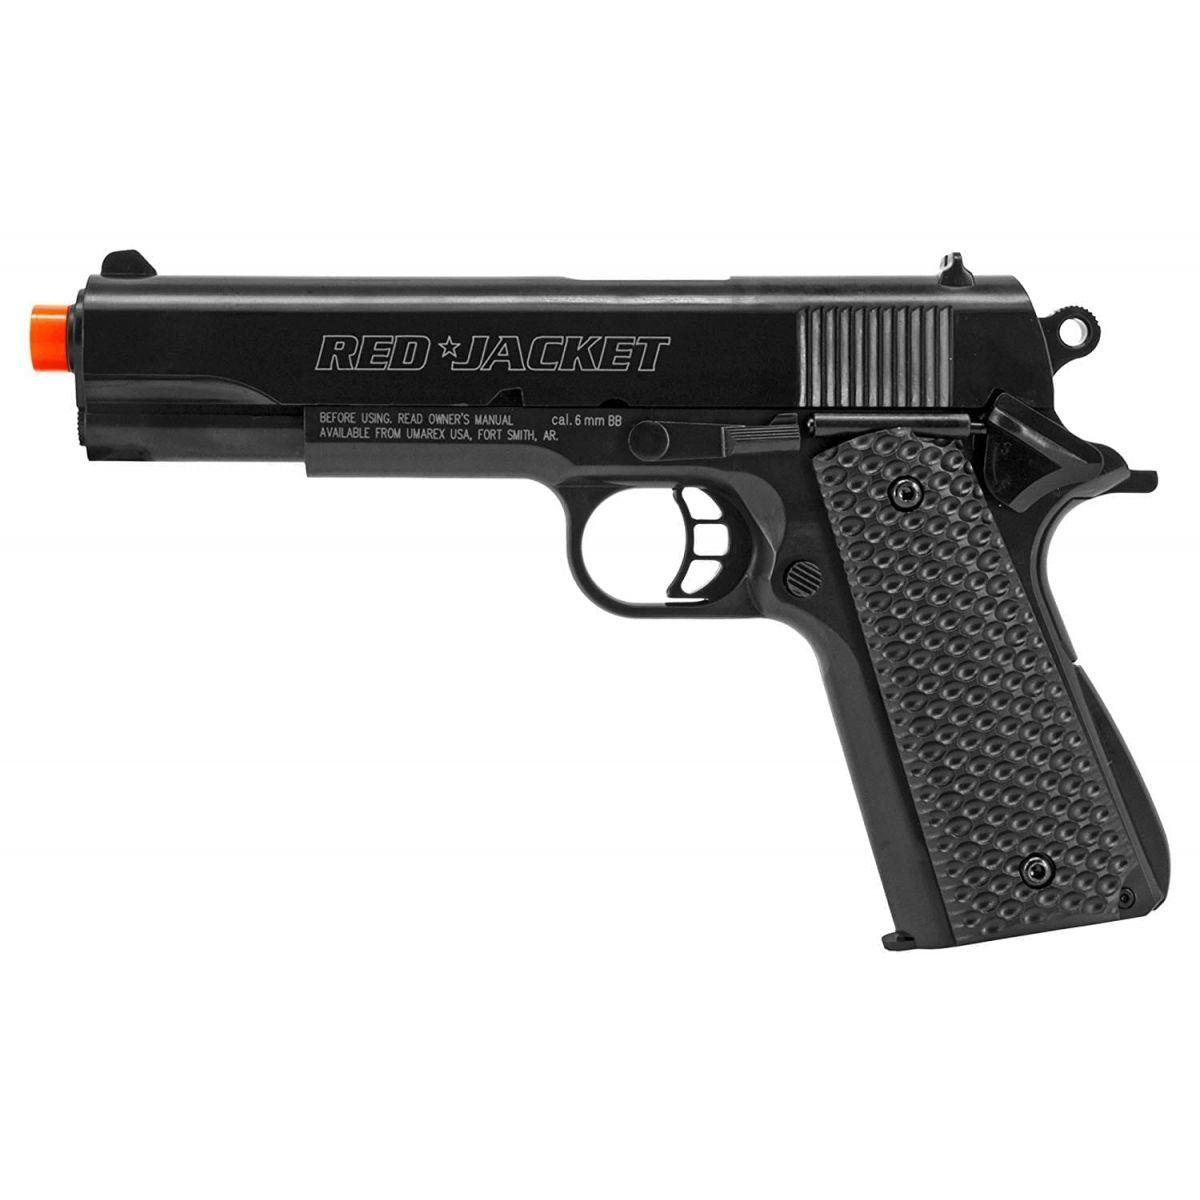 Umarex Red Jacket M1911 6mm Airsoft Spring Pistol Target Pack starter